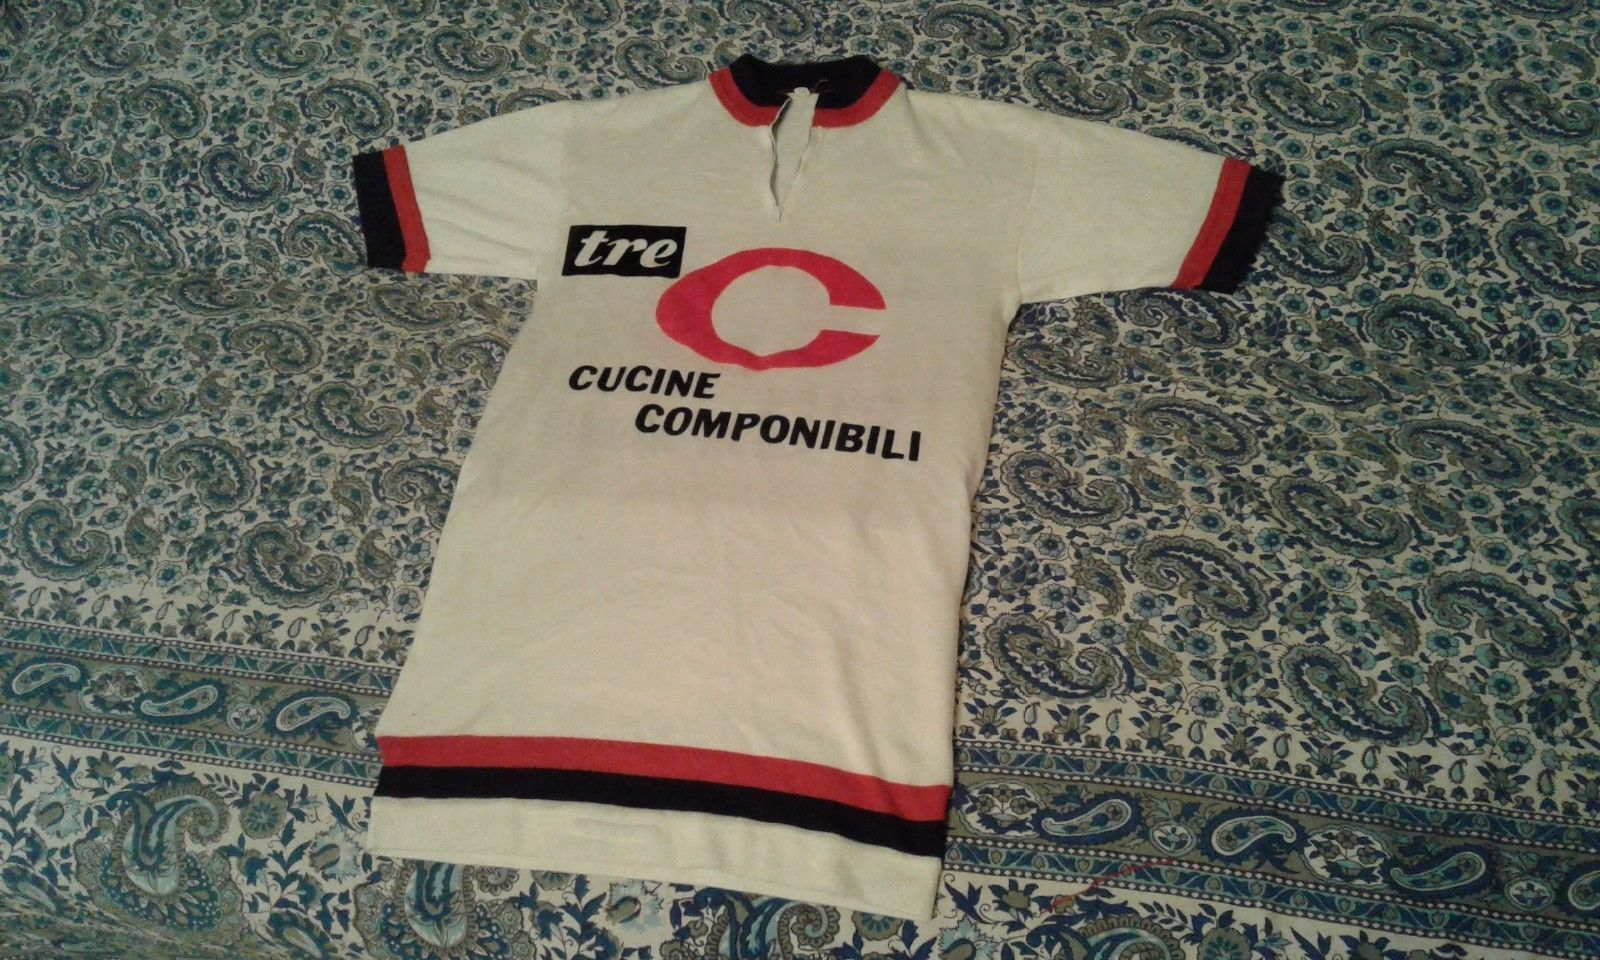 Maglia shirt vintage ciclismo cycling anni 70/80 wool lana size 3 ...